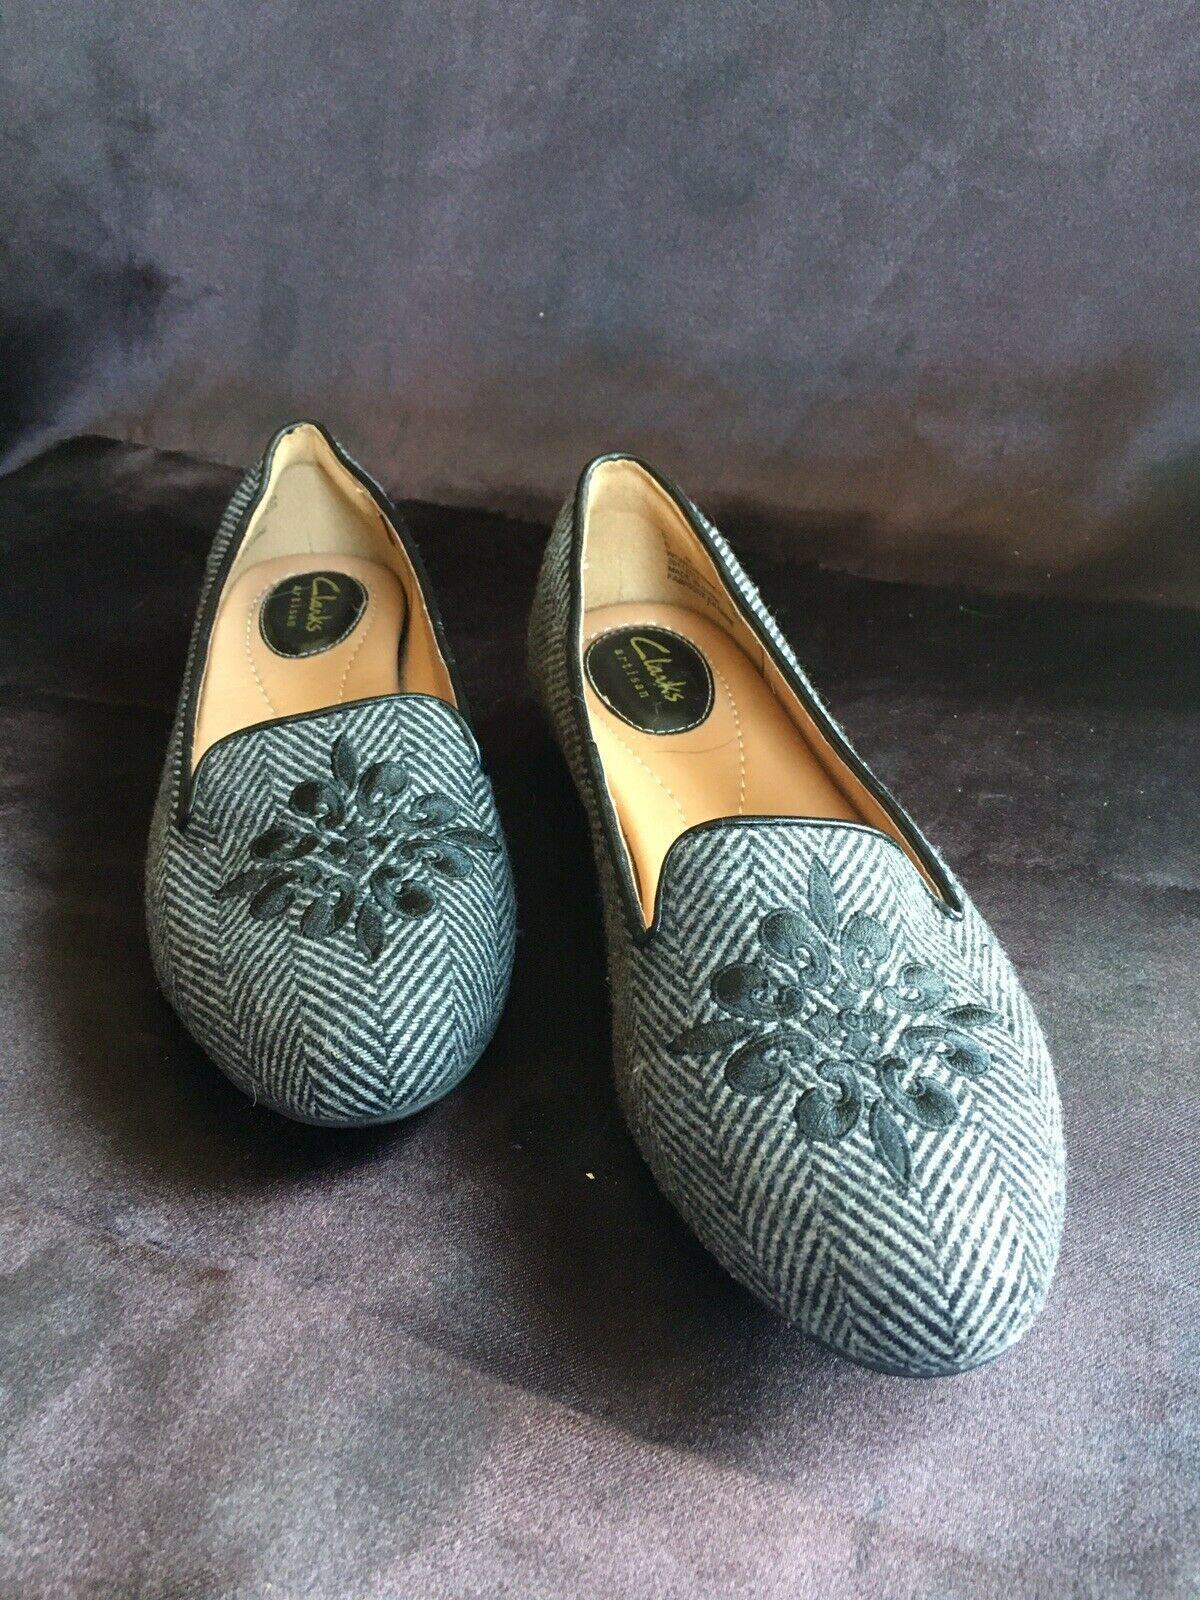 Clarks Artisan Alitay Kallen Women's Slip-On Flats / Shoes, Size 7.5, NWOB